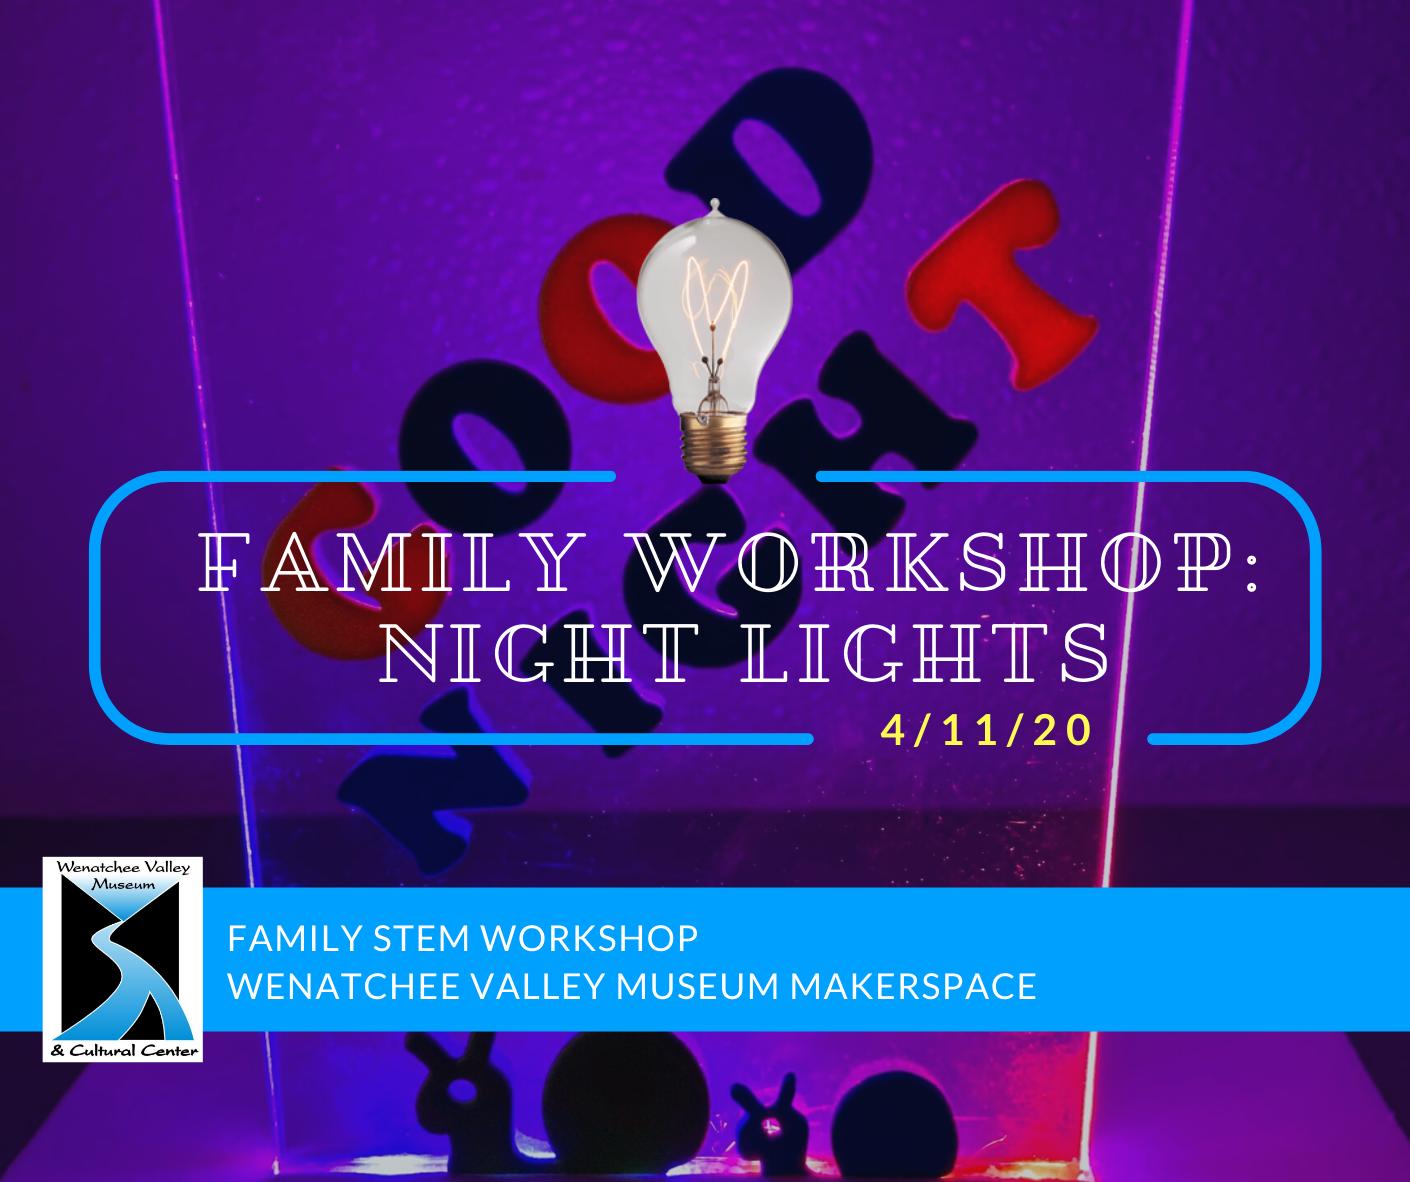 Family Workshop: Night Lights